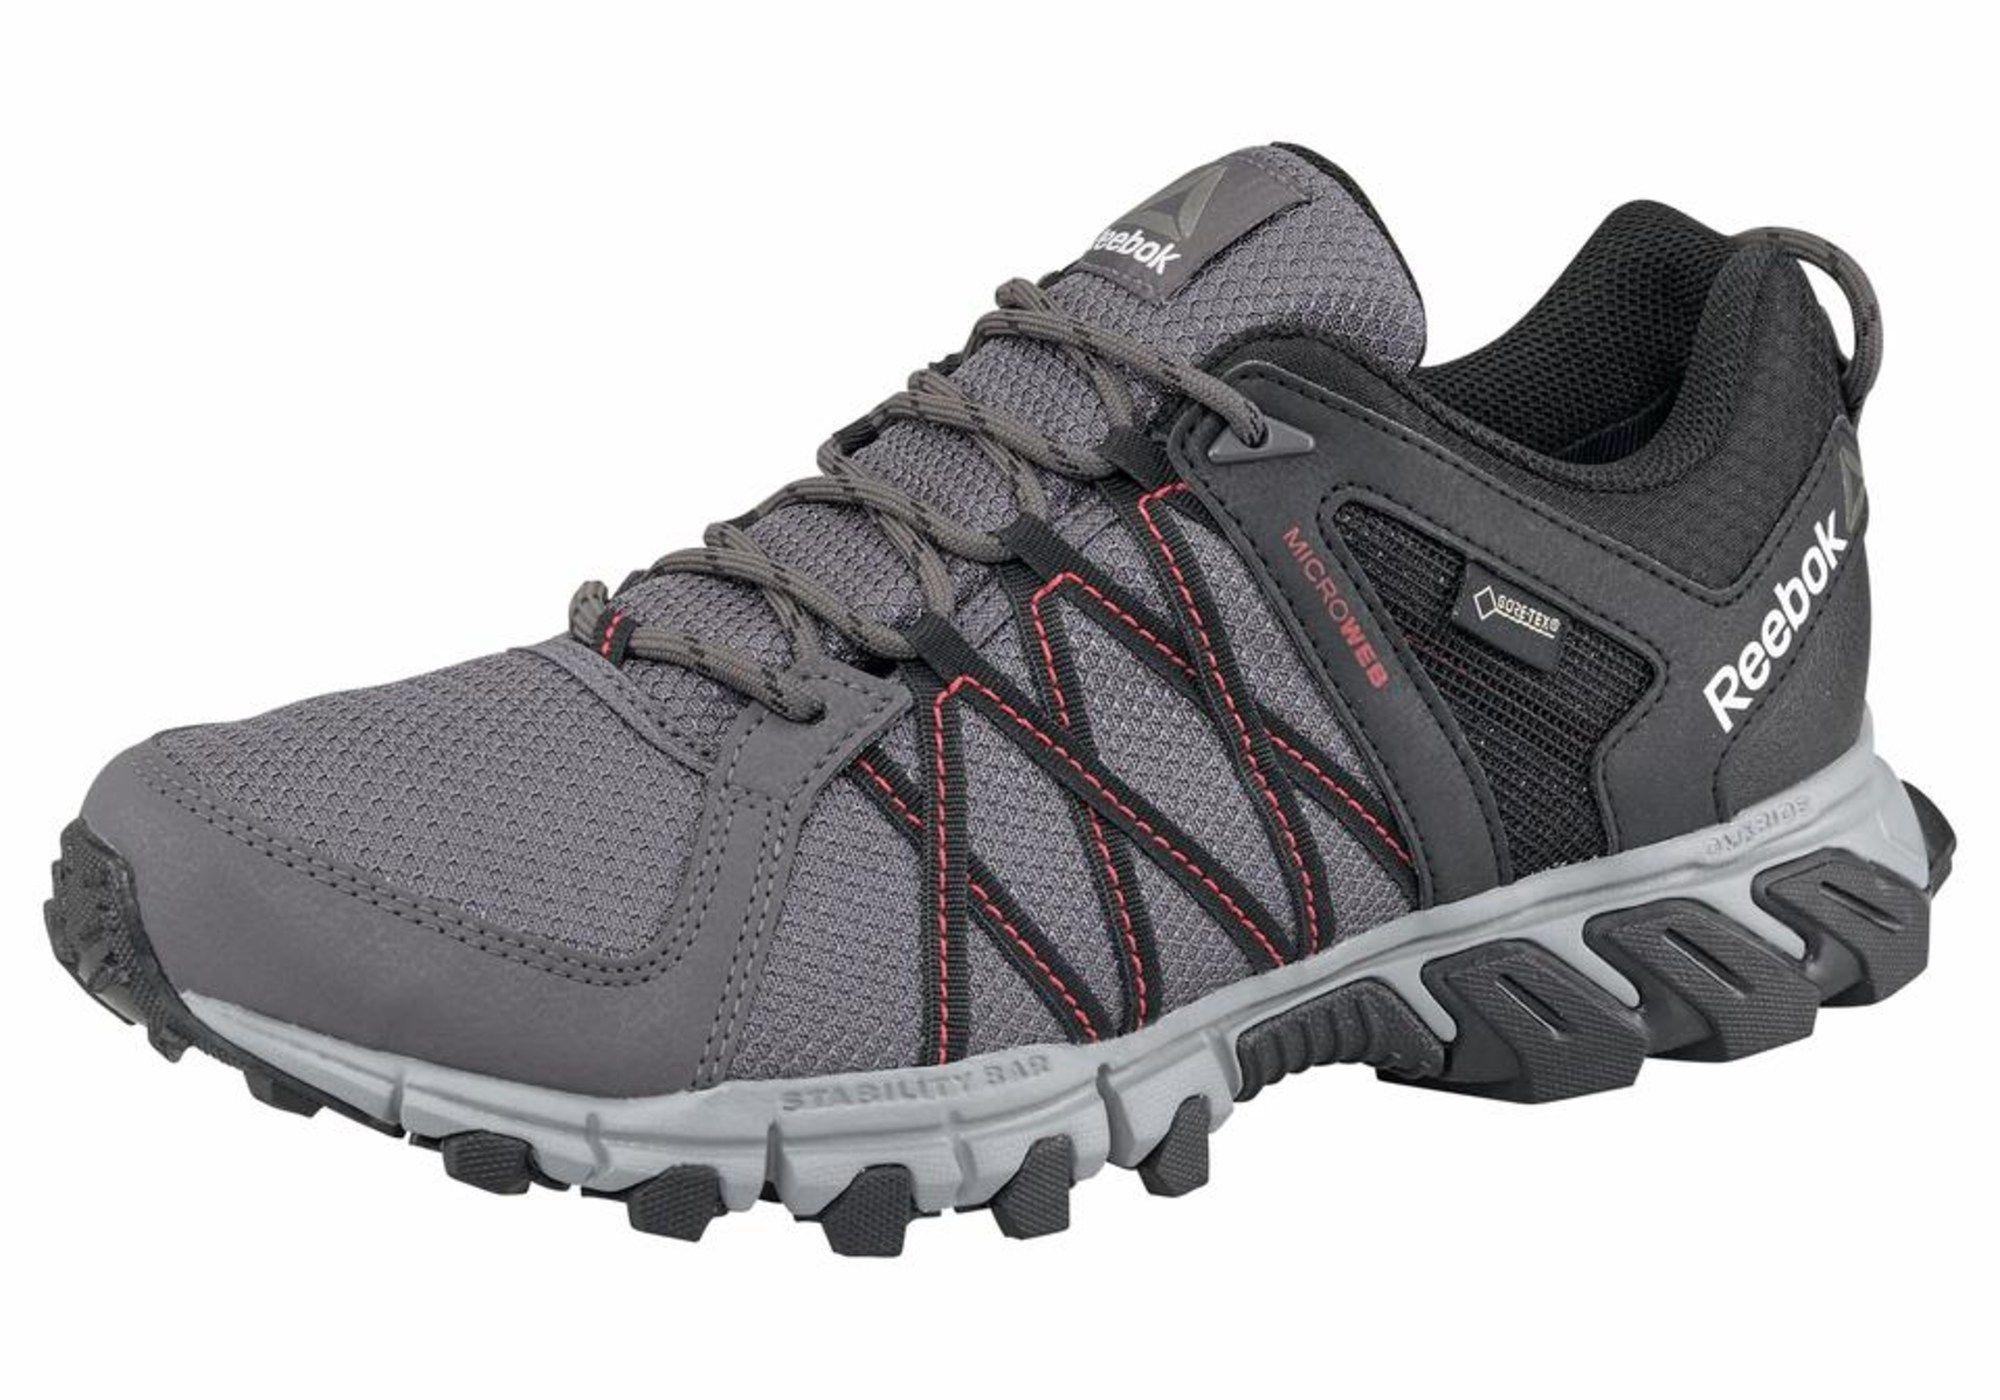 AboutYou #REEBOK #Schuhe #Herren #REEBOK #Walkingschuh